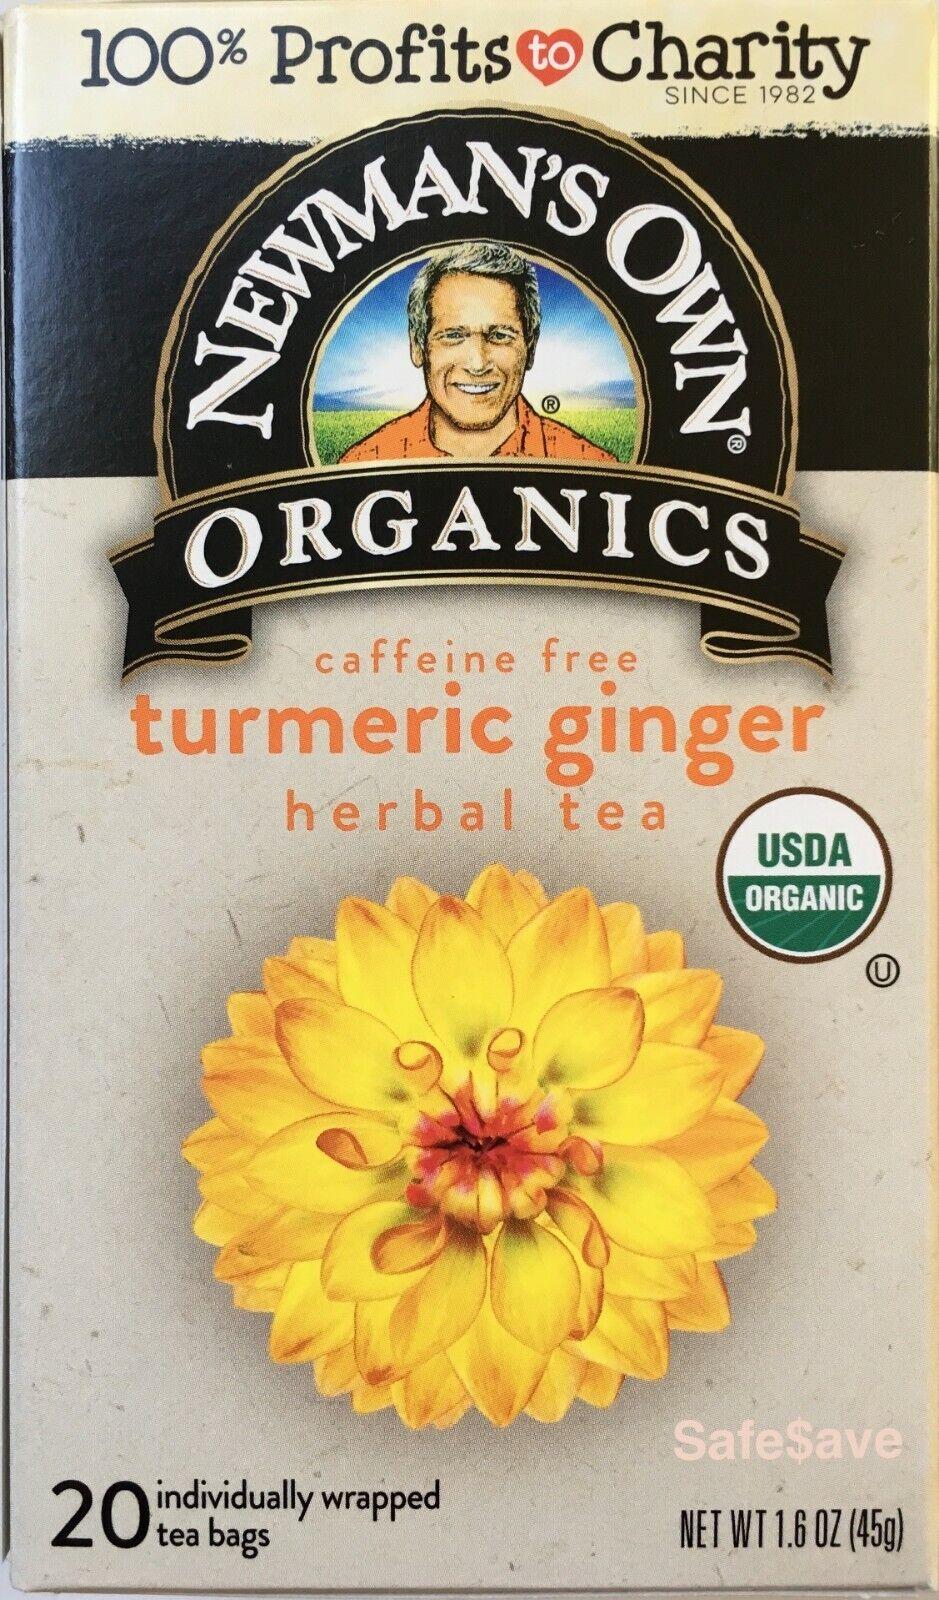 Organic Ginger Turmeric  Tea, 20 Count Newman's Own Organics